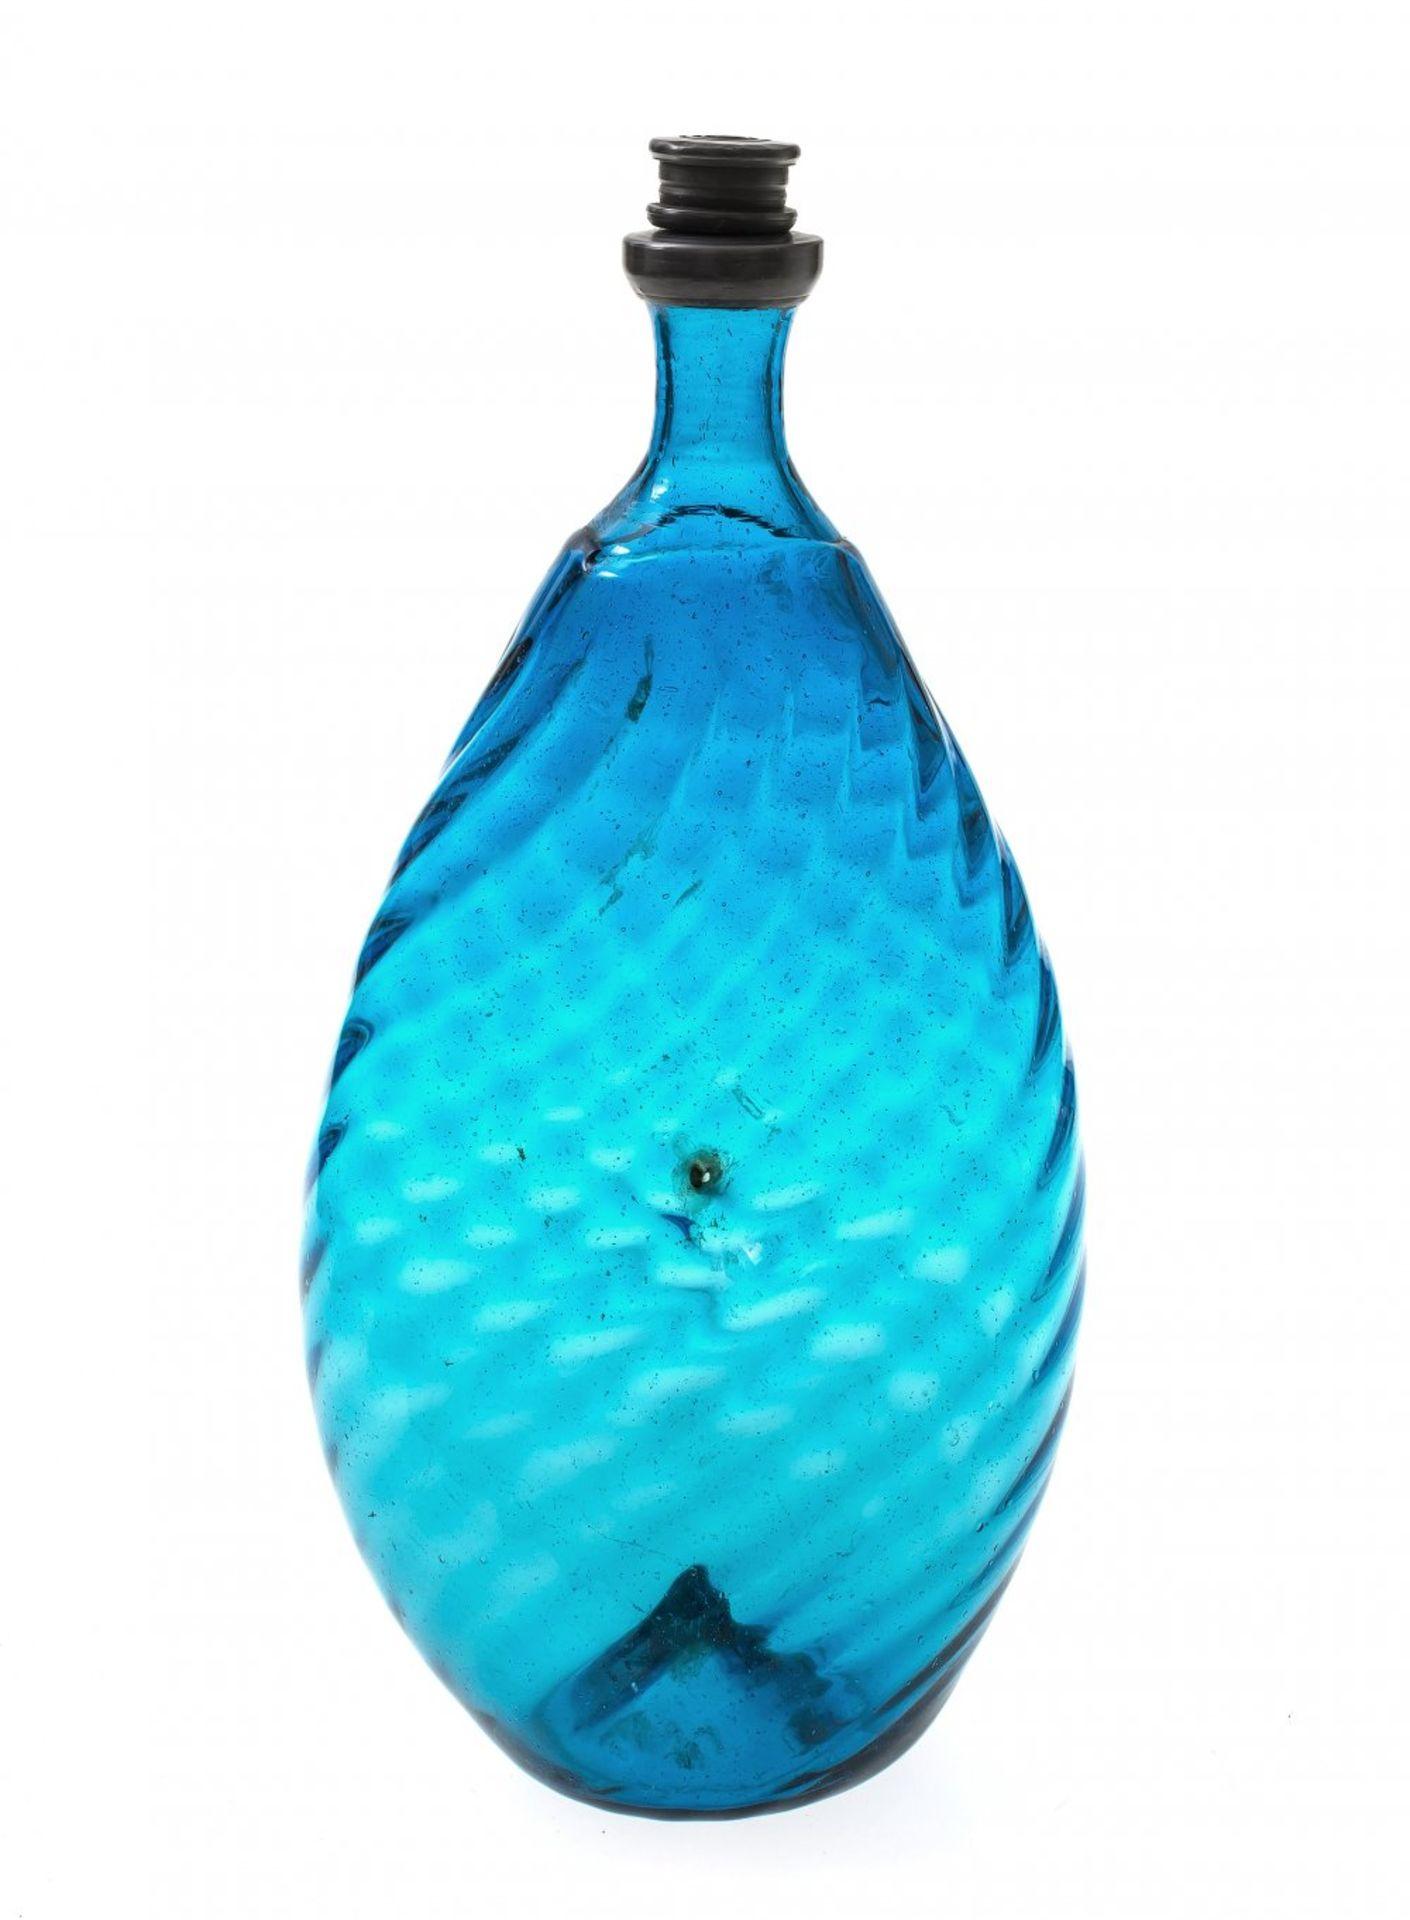 Los 51 - Nabelflasche